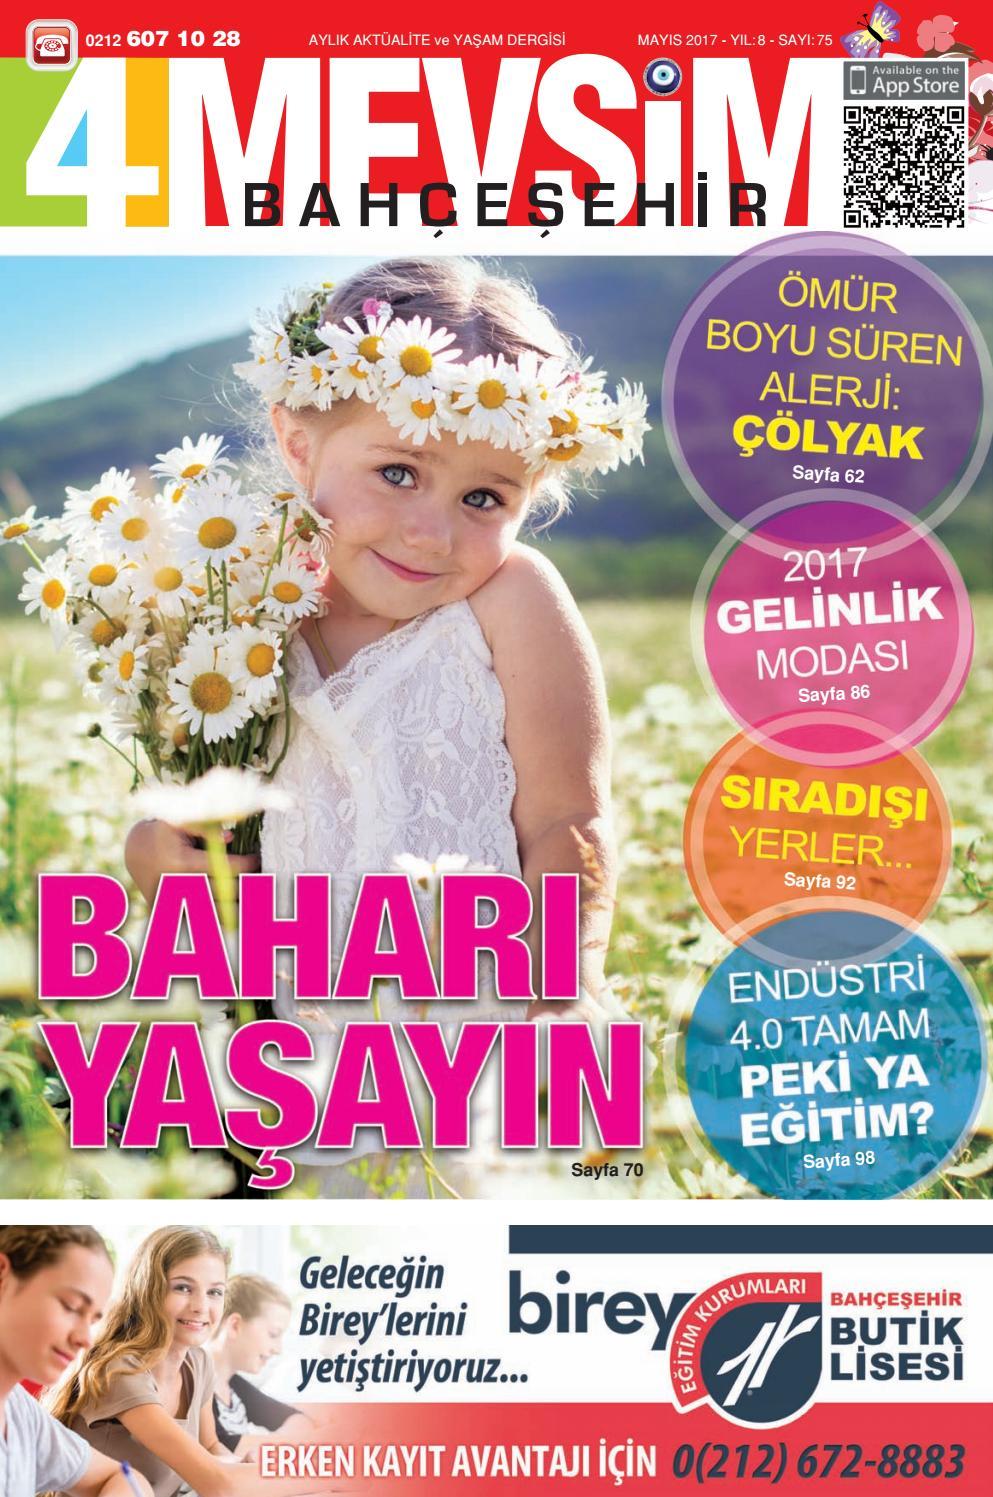 a8b9c68f7be55 4 Mevsim Bahçeşehir Sayı 75 by Dort Mevsim Bahcesehir - issuu